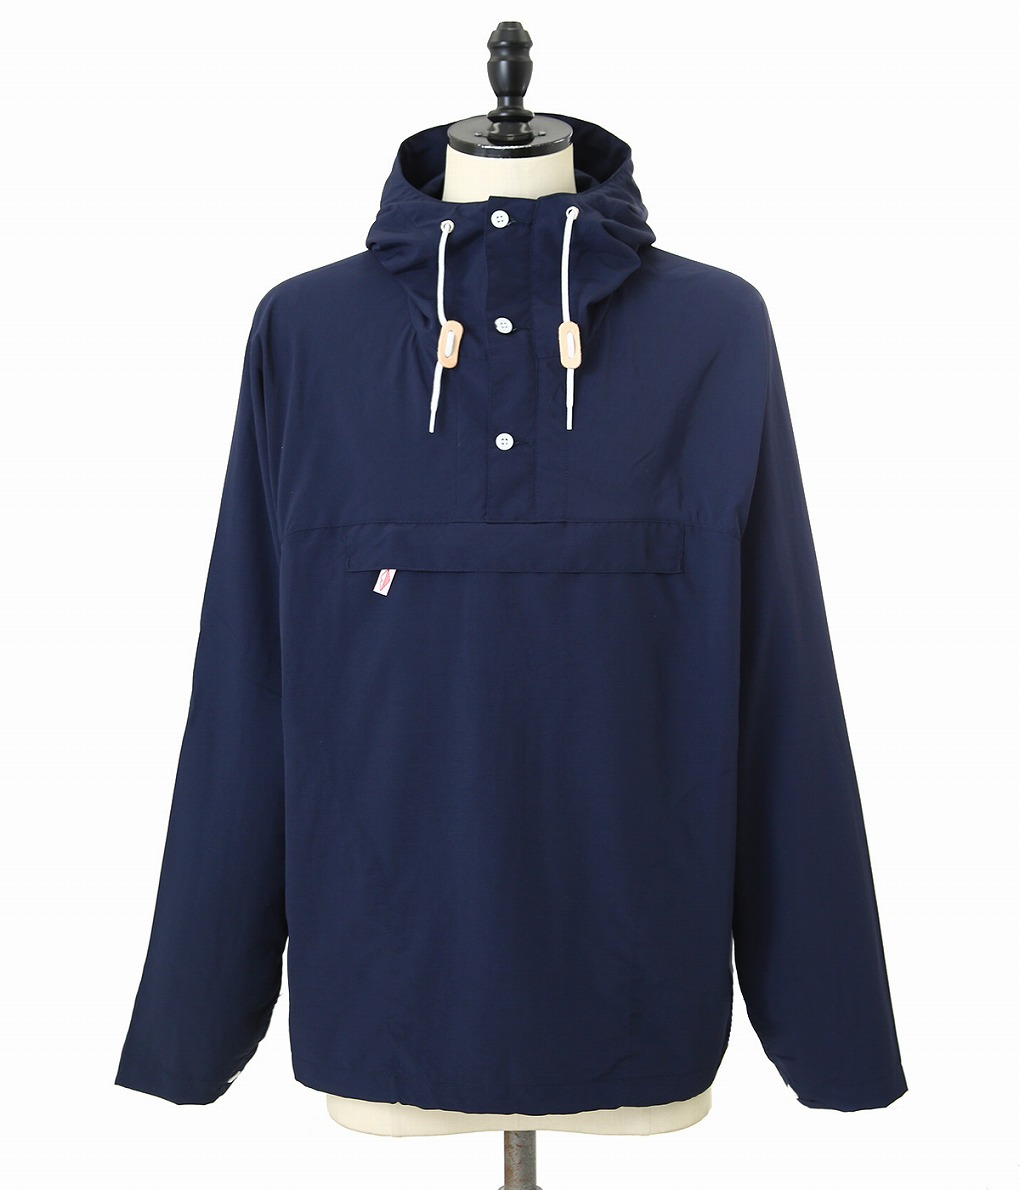 Battenwear / バテンウェアー : PACKABLE ANORAK : パックバルアノラック アウター フード パーカー メンズ : SS19103A 【AST】